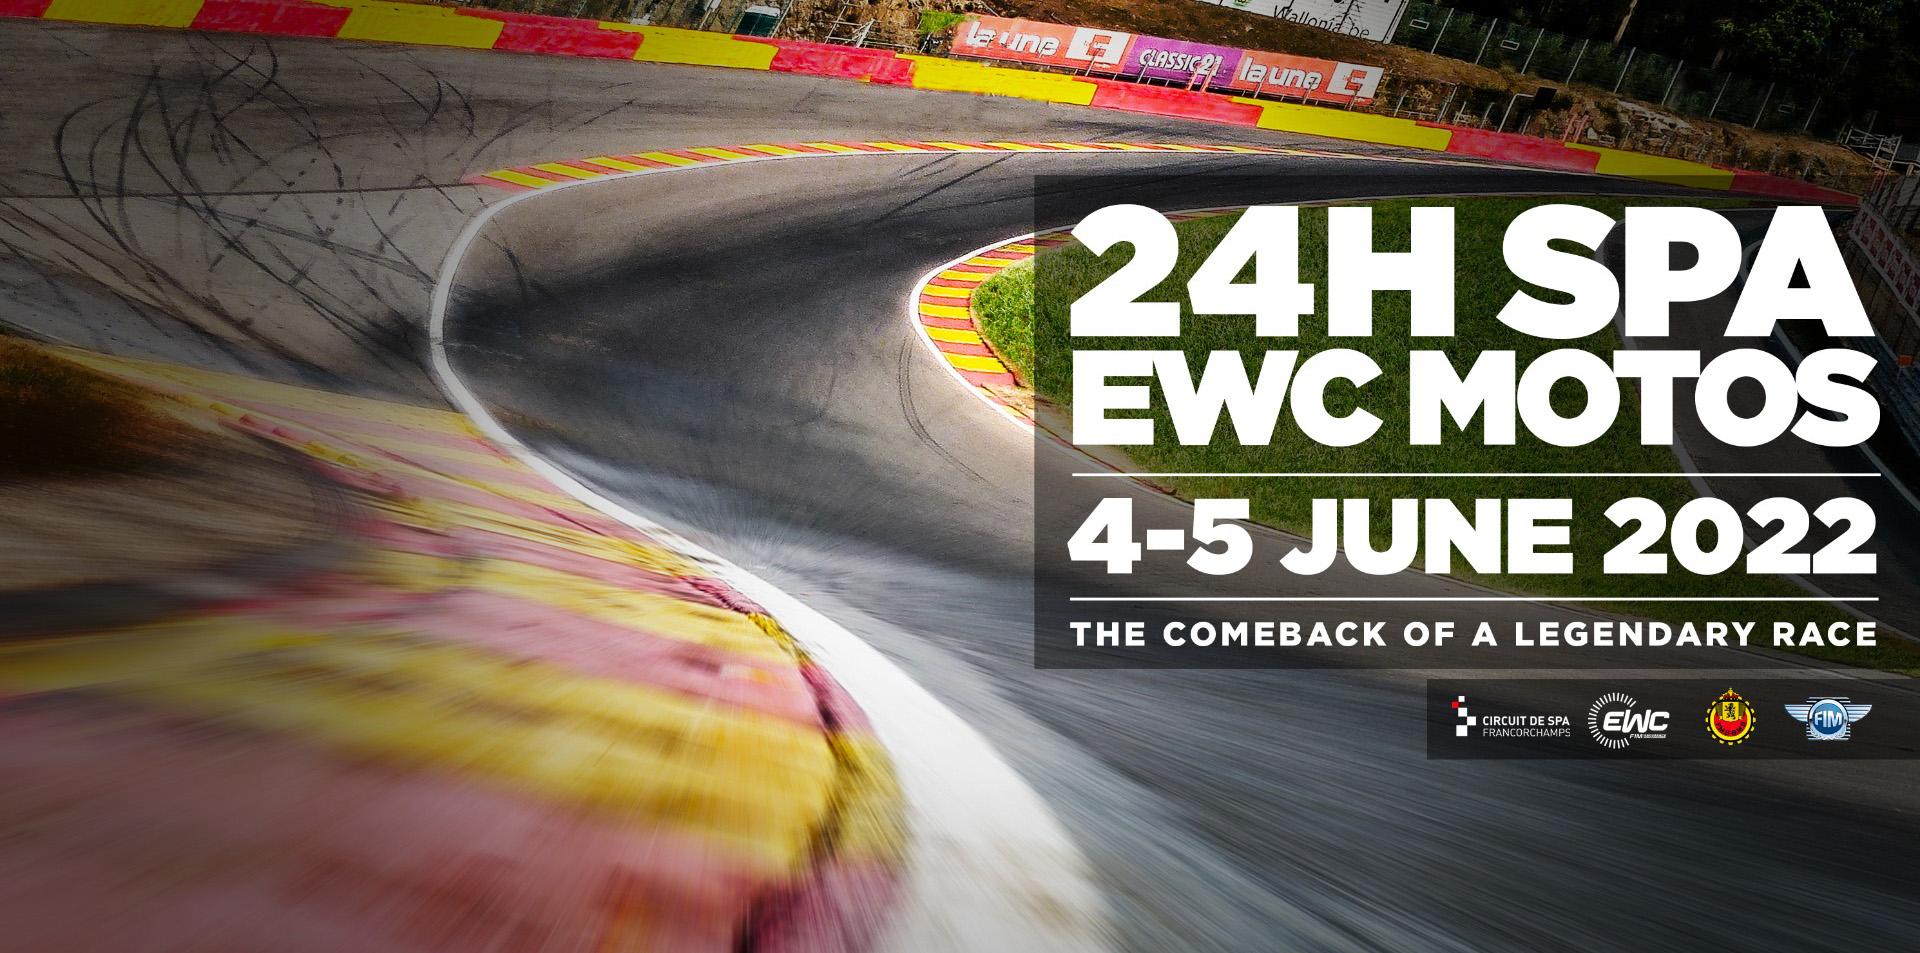 24H SPA EWC Motos 2022